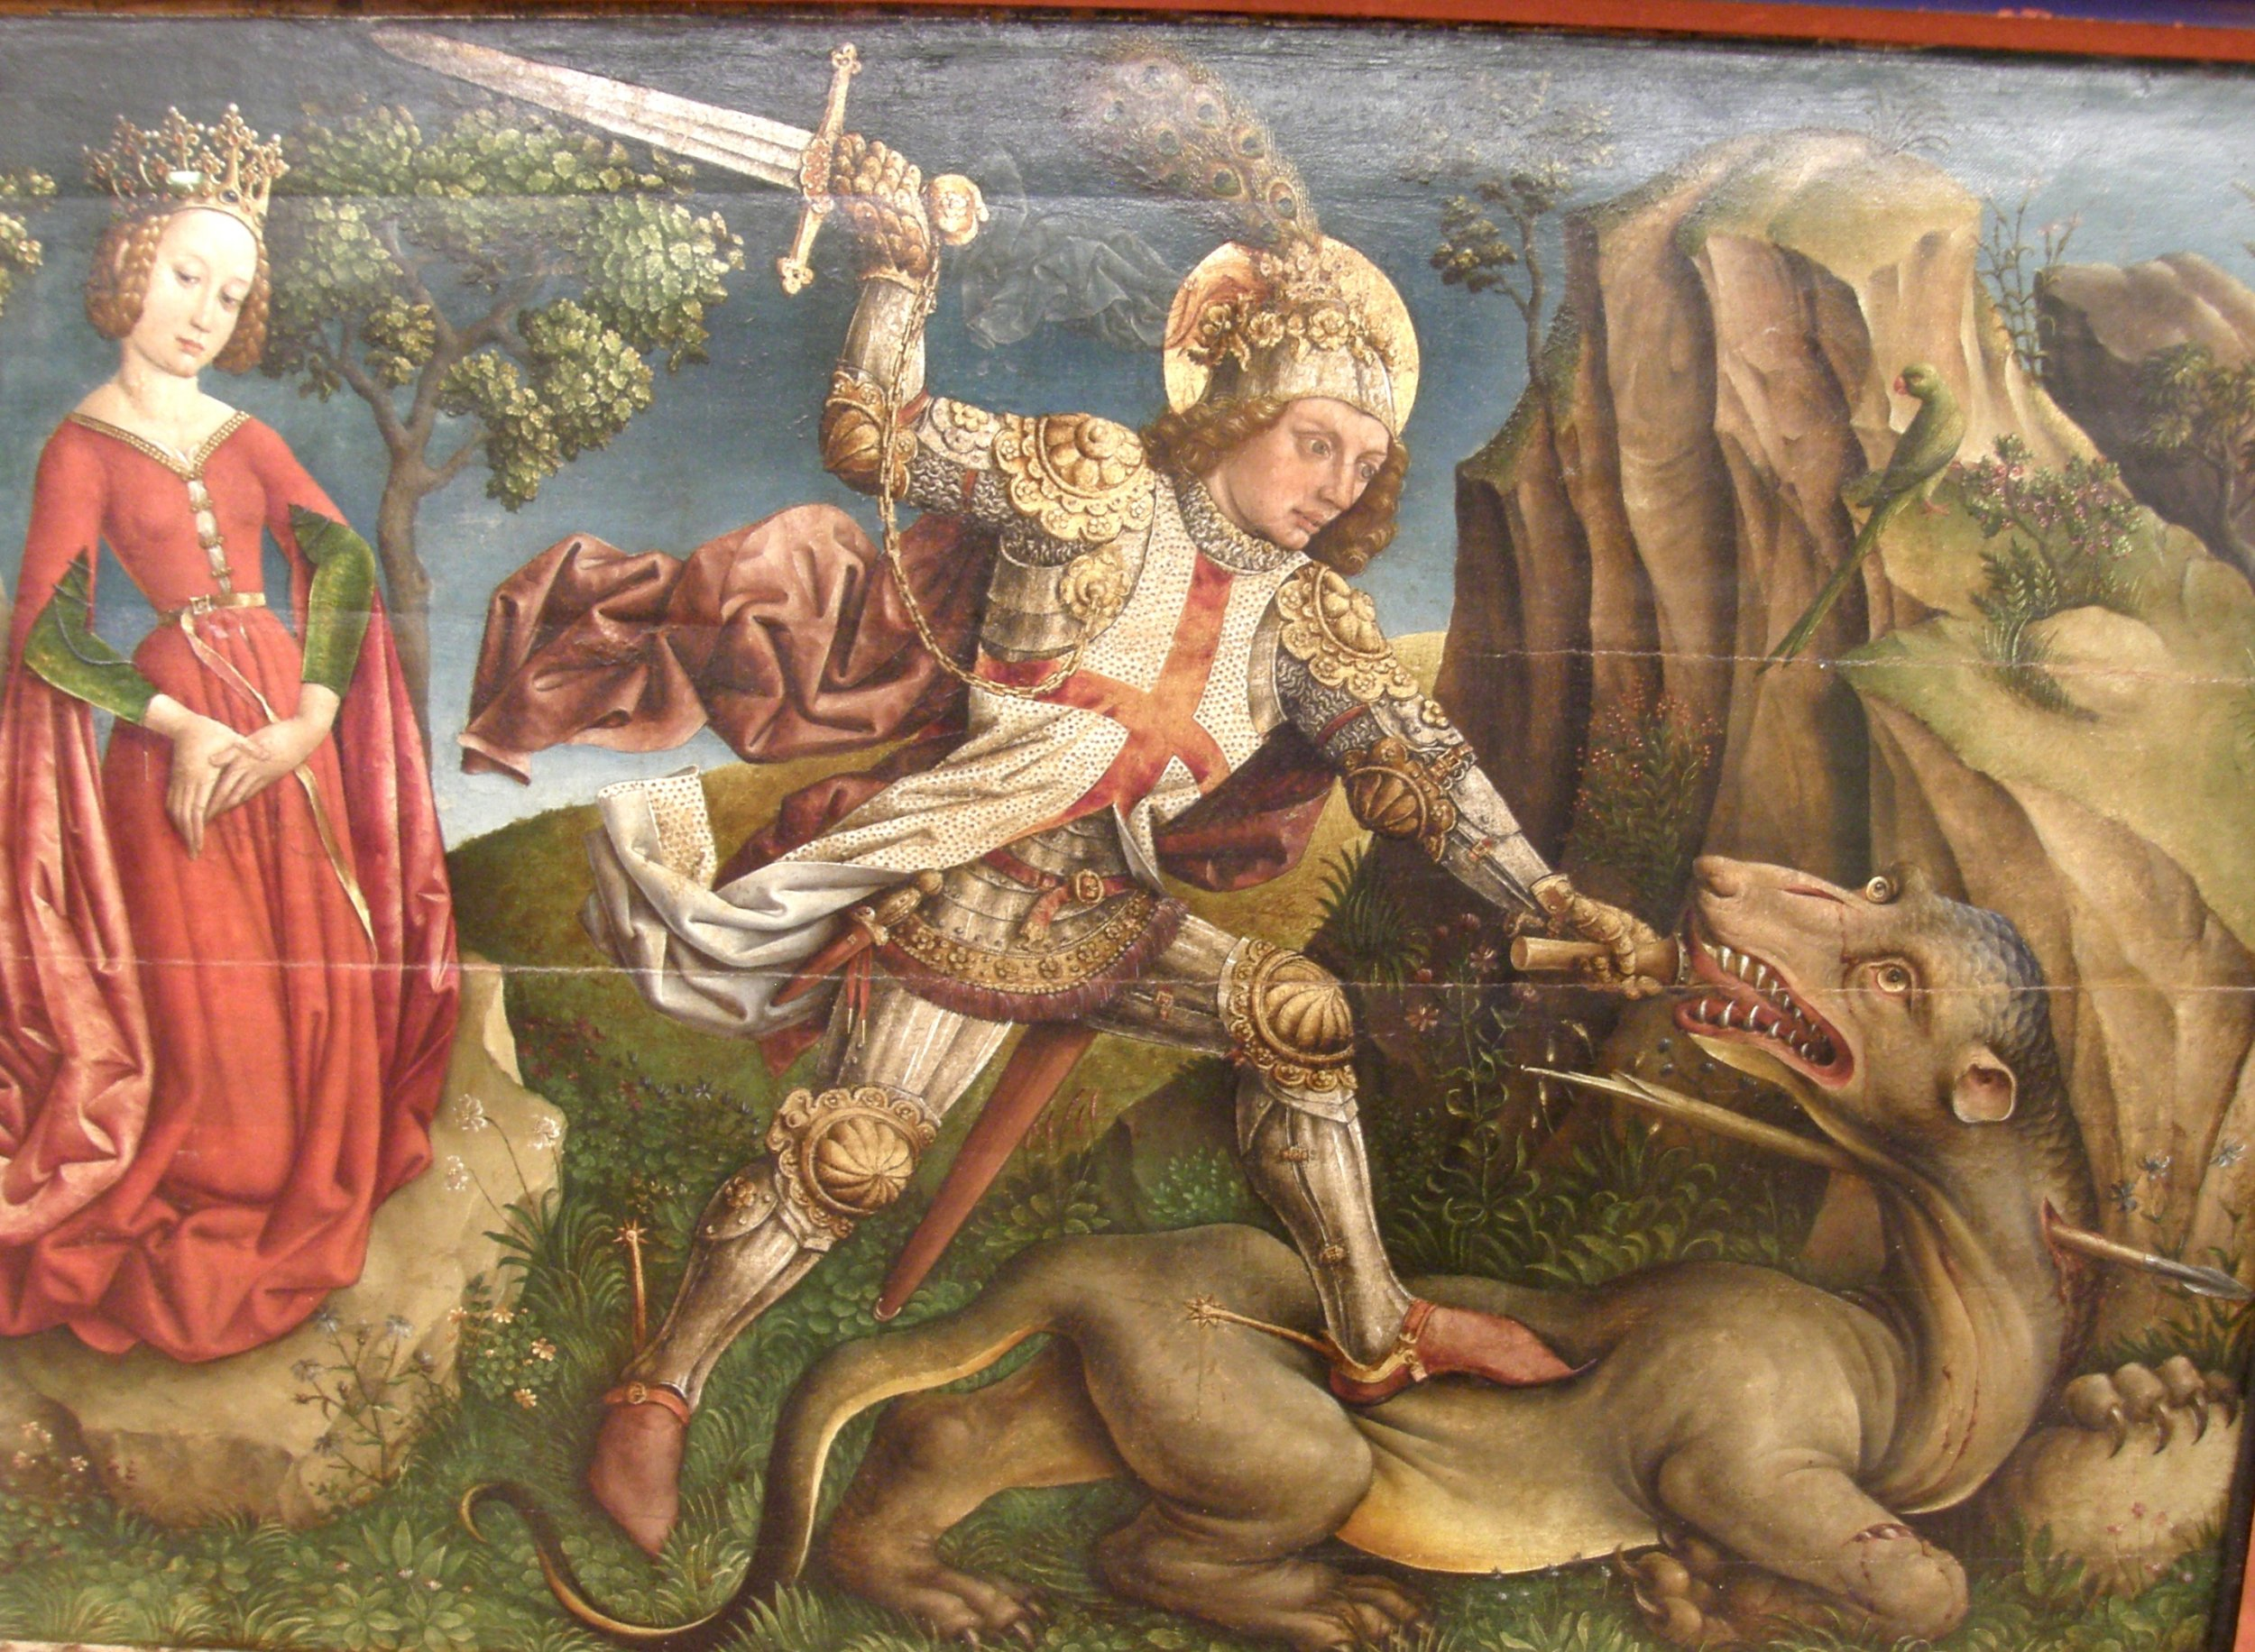 Jost_Haller _-_ Saint_George_slaying_the_dragon, _Unterlinden_Museum, _Colmar